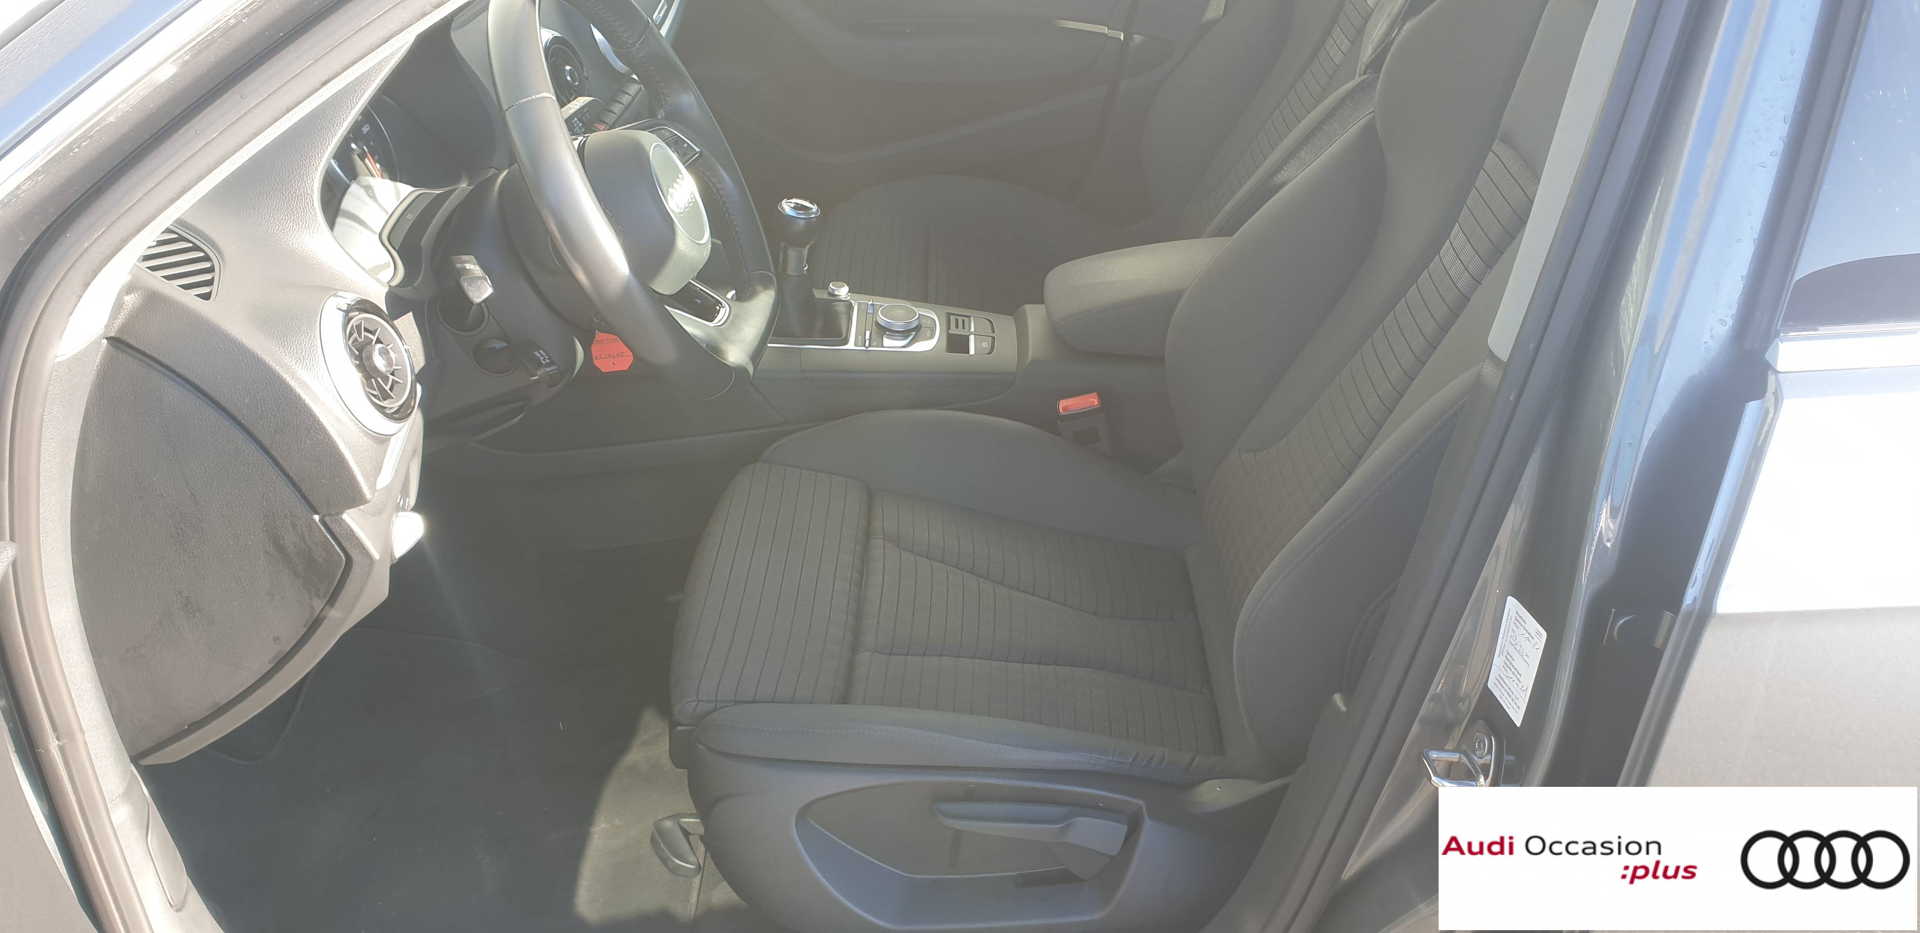 5 - A3 Sportback 1.6 TDI 116